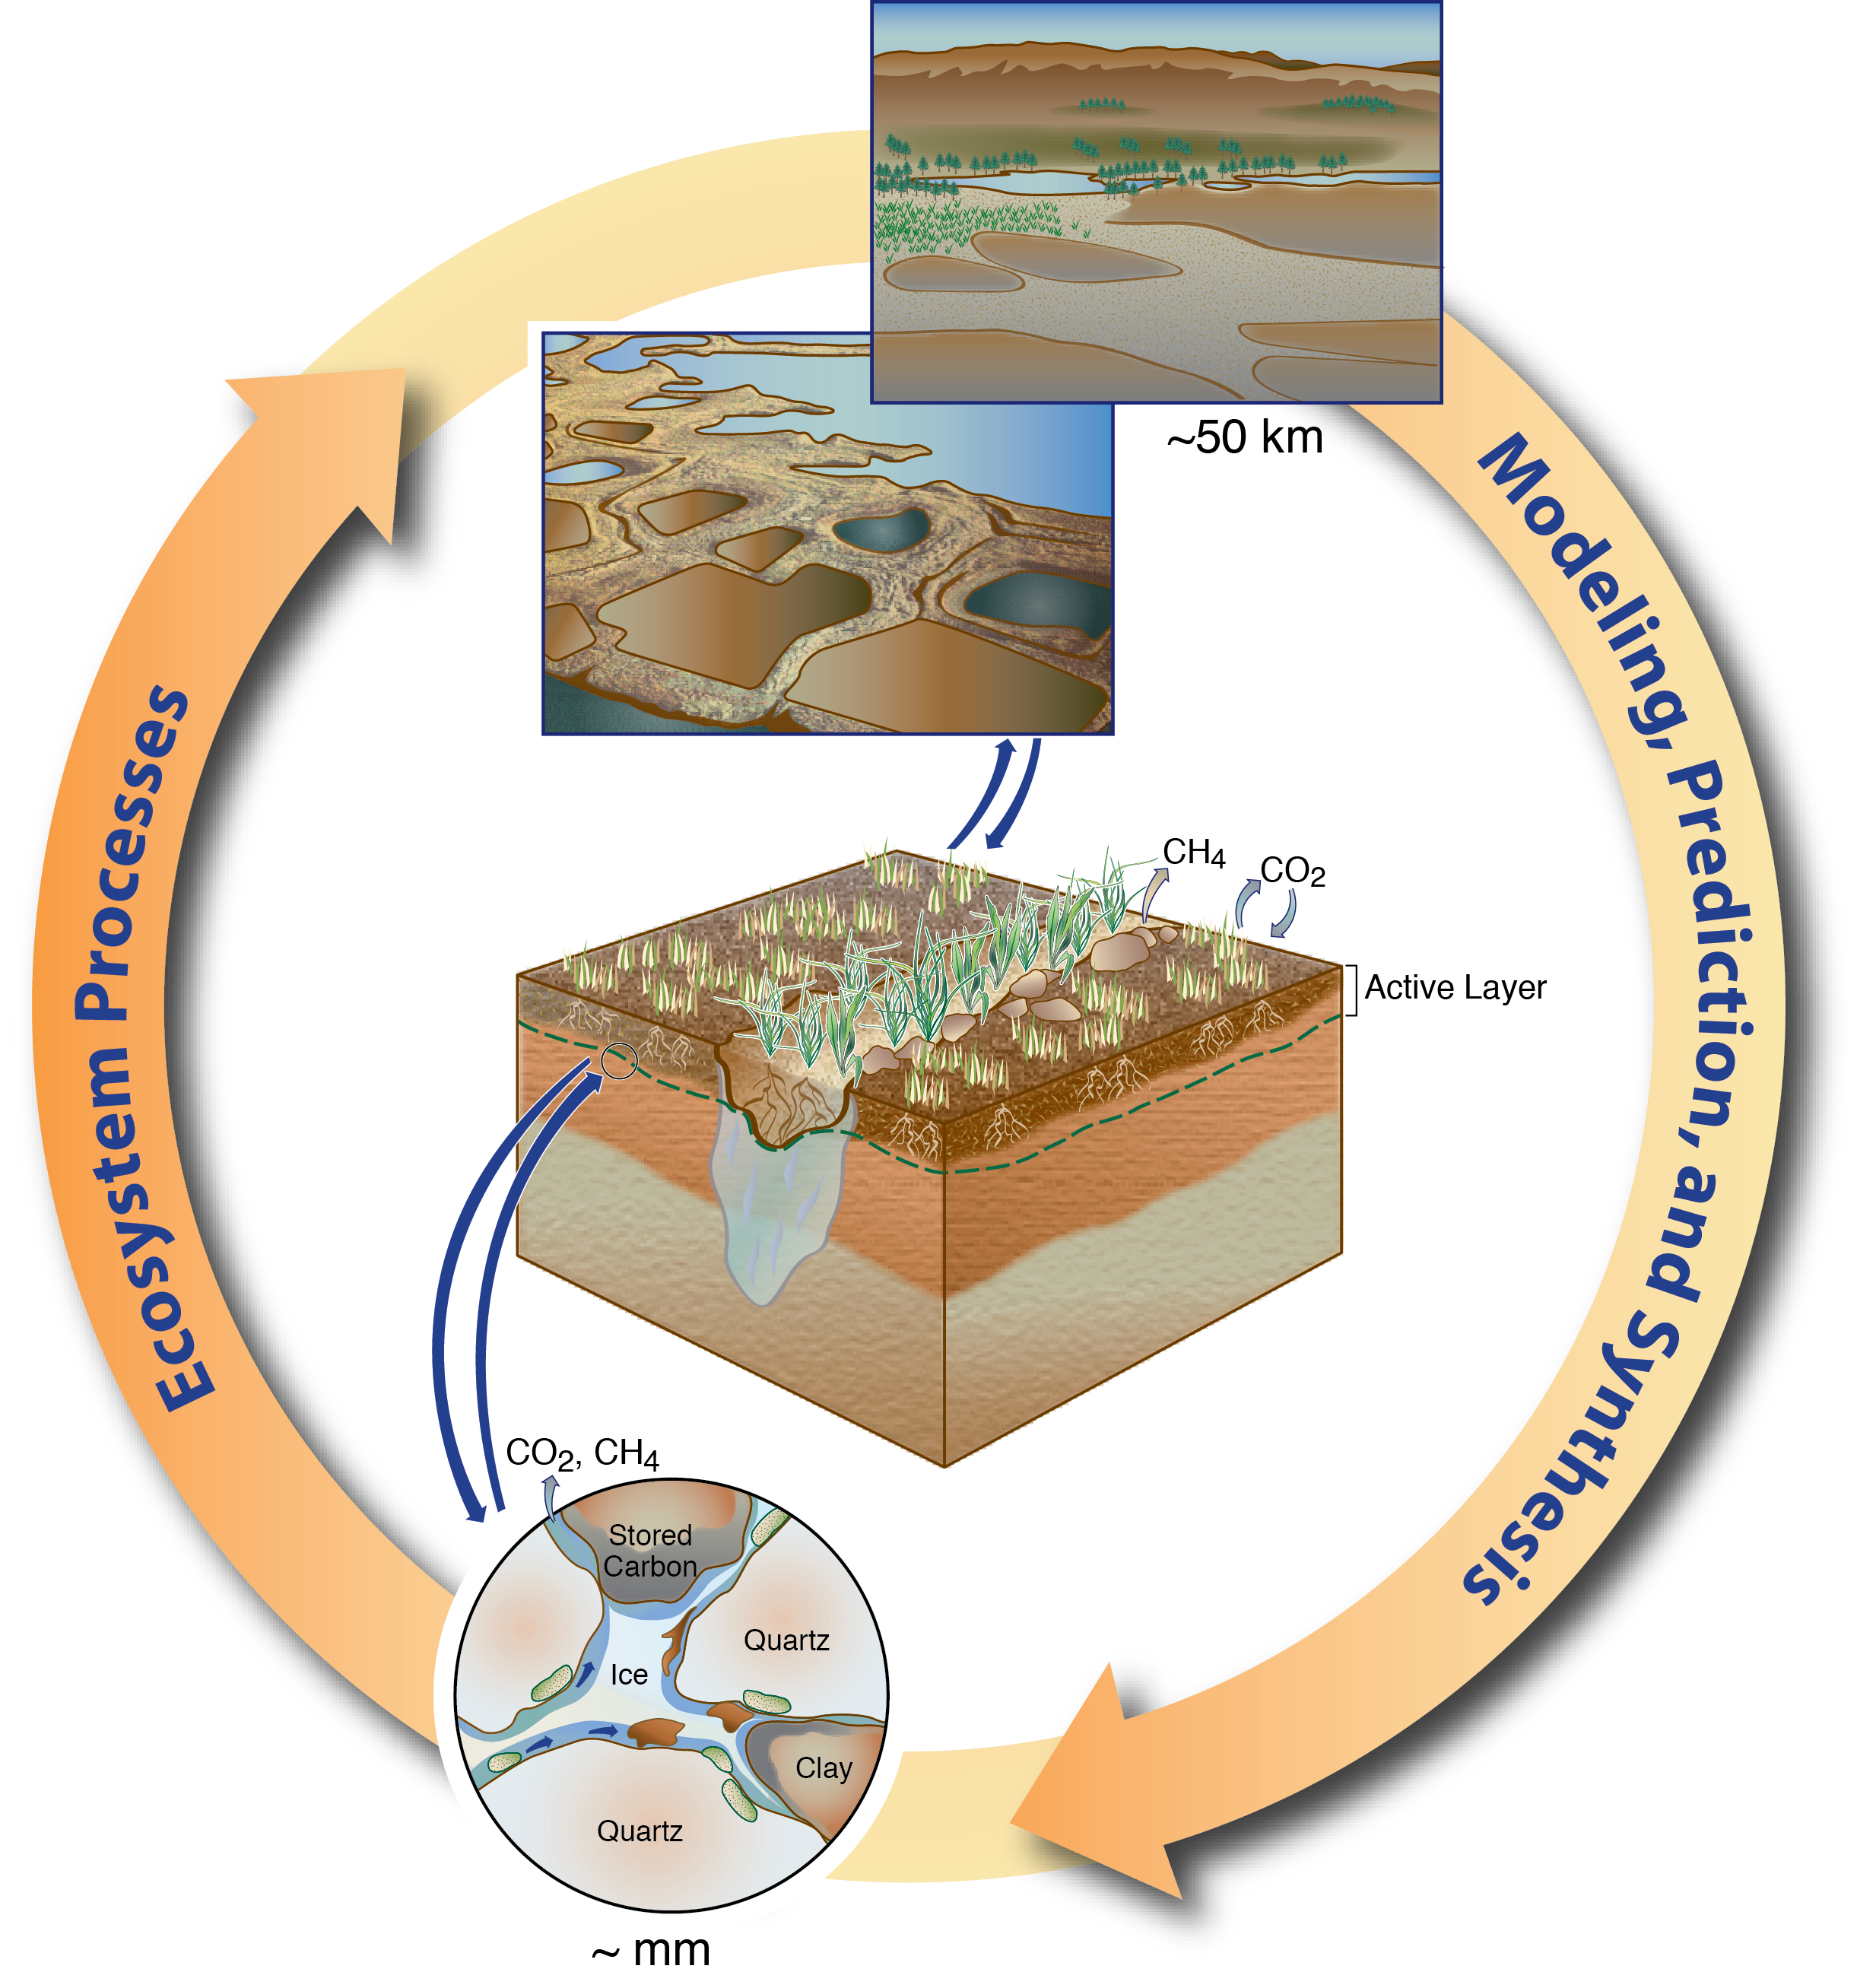 Terrestrial ecosystem science u. Energy clipart environmental study